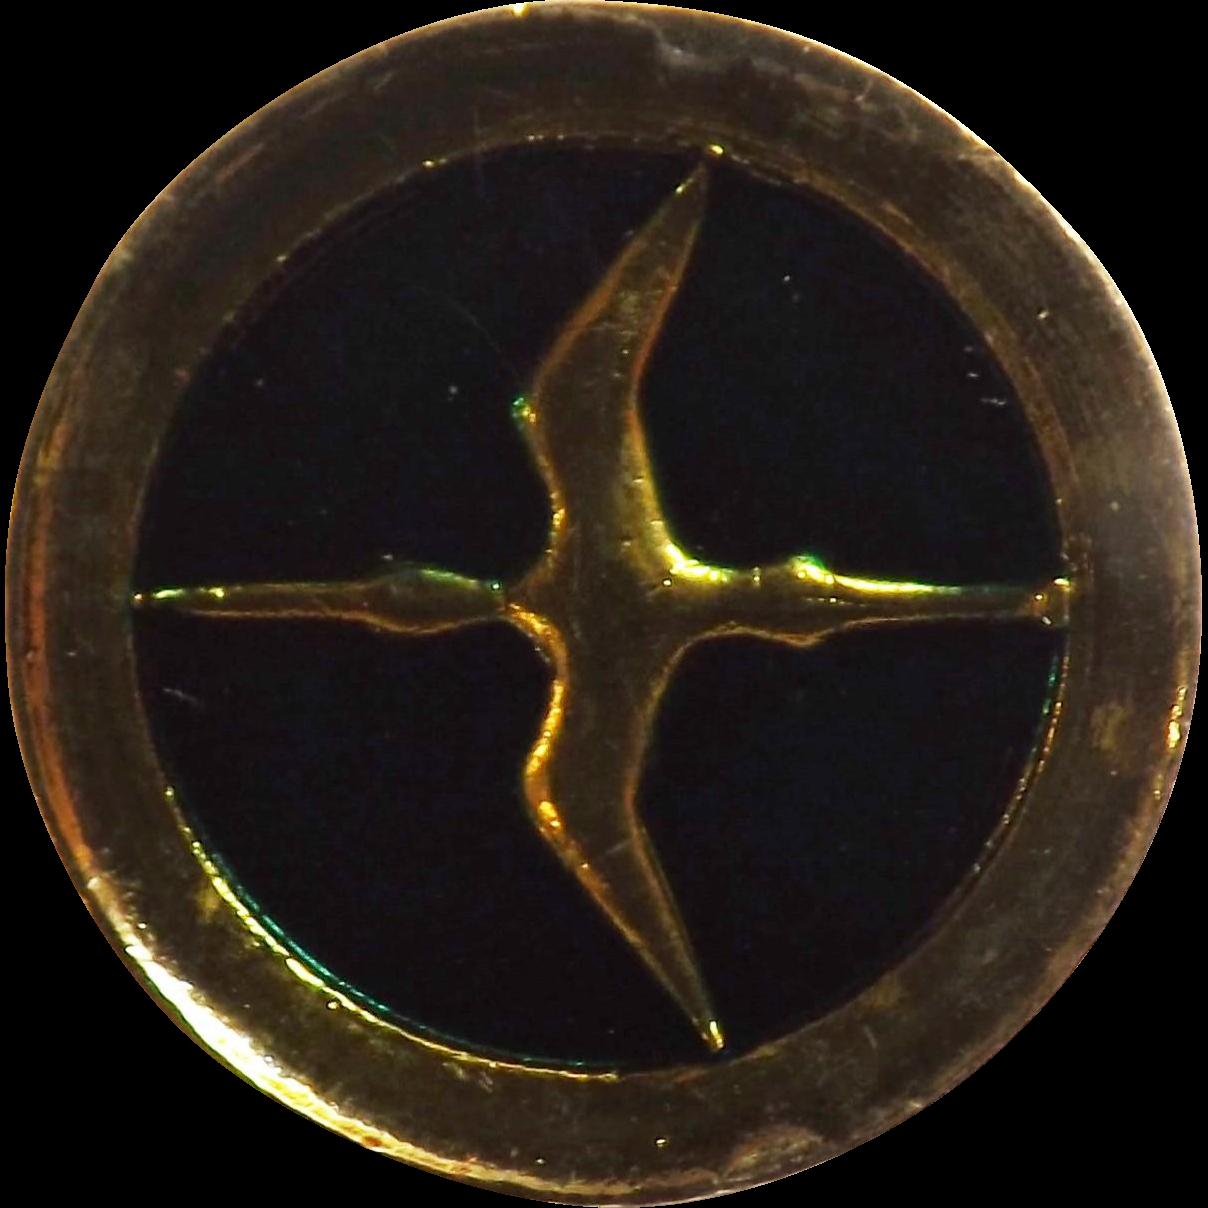 NAC - National Airways Corporation of New Zealand - Stewardess Cap Badge